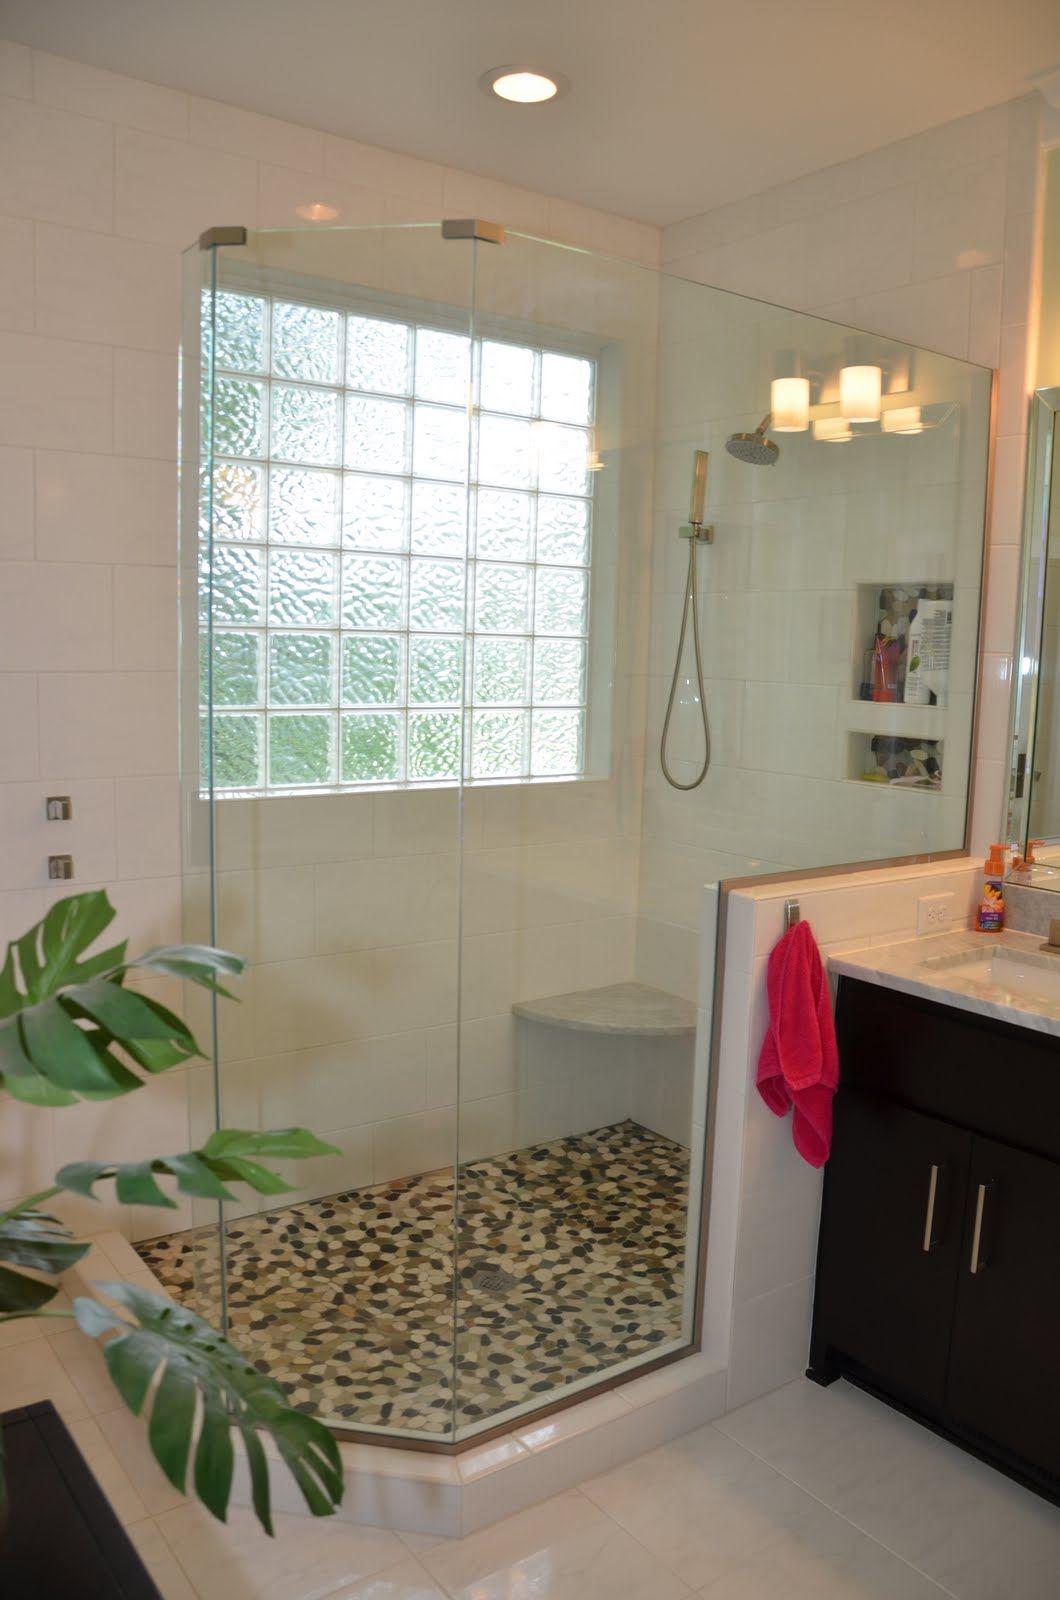 http://www.trendmarkinc.com/bathroom-remodeling-nc - Let ...